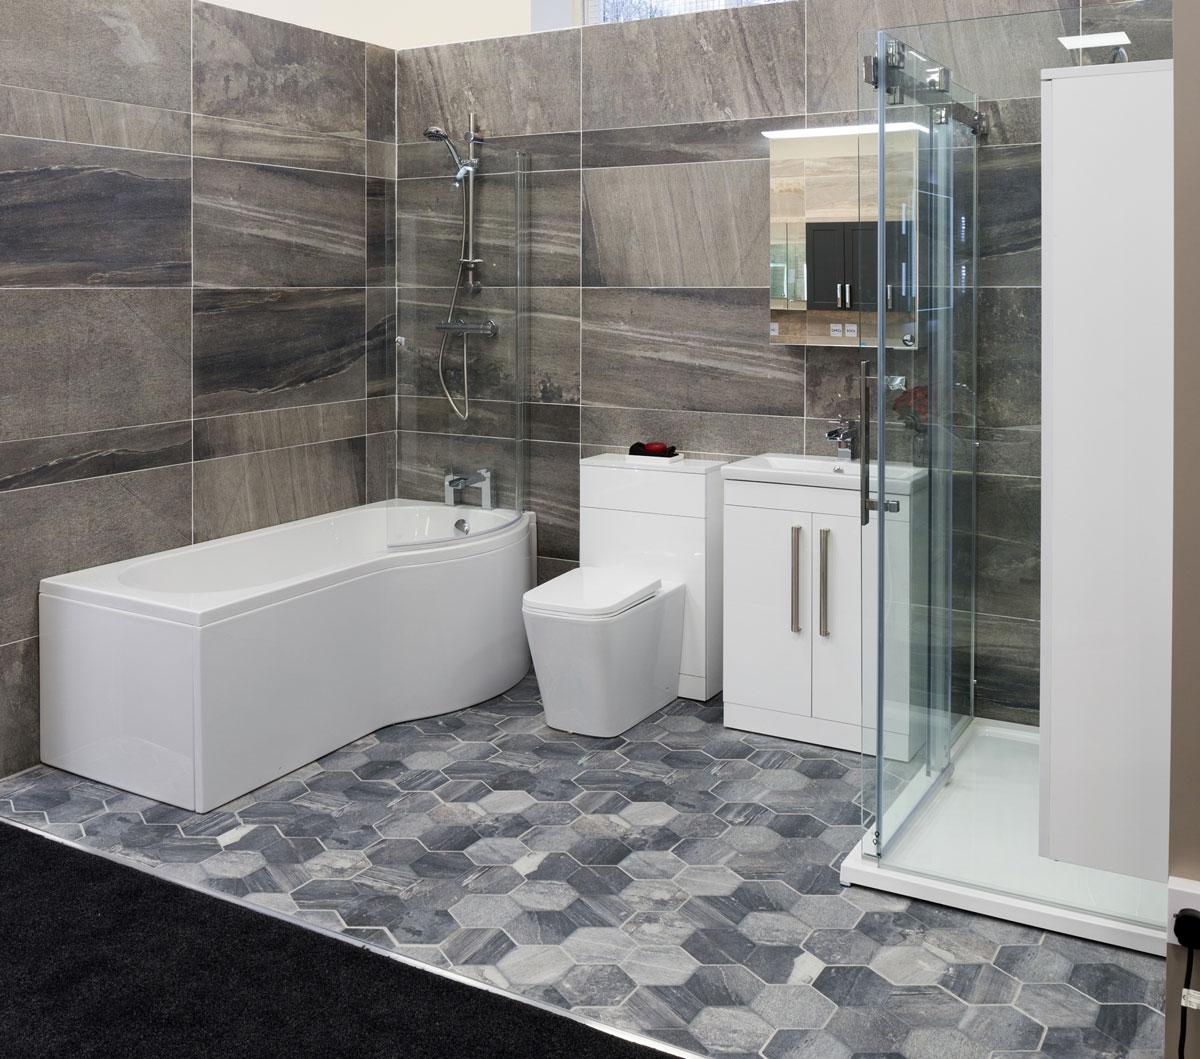 desain kamar mandi modern - Arriba Design